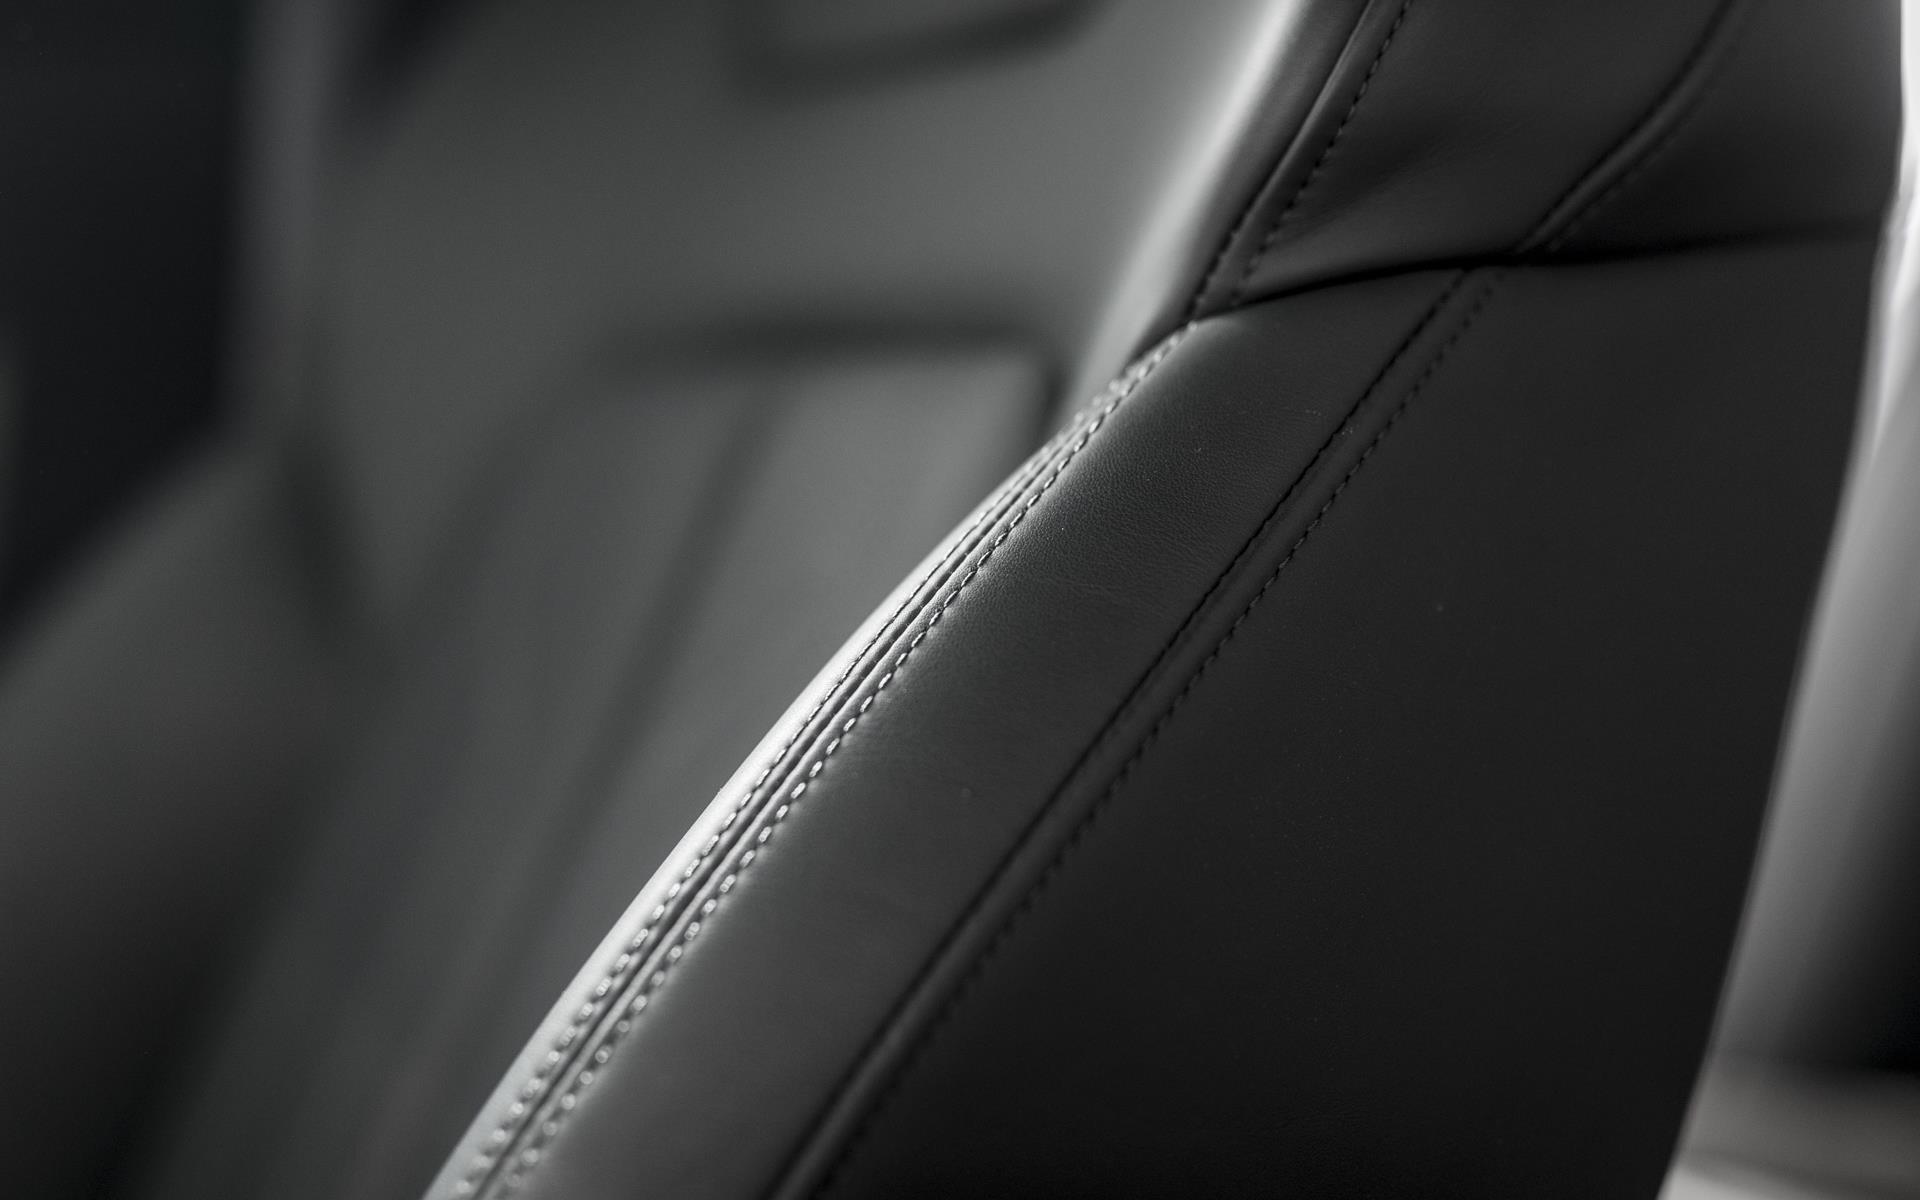 45 Avant 3,0 TDI S Line Quattro Tiptronic 231HK Stc  image21